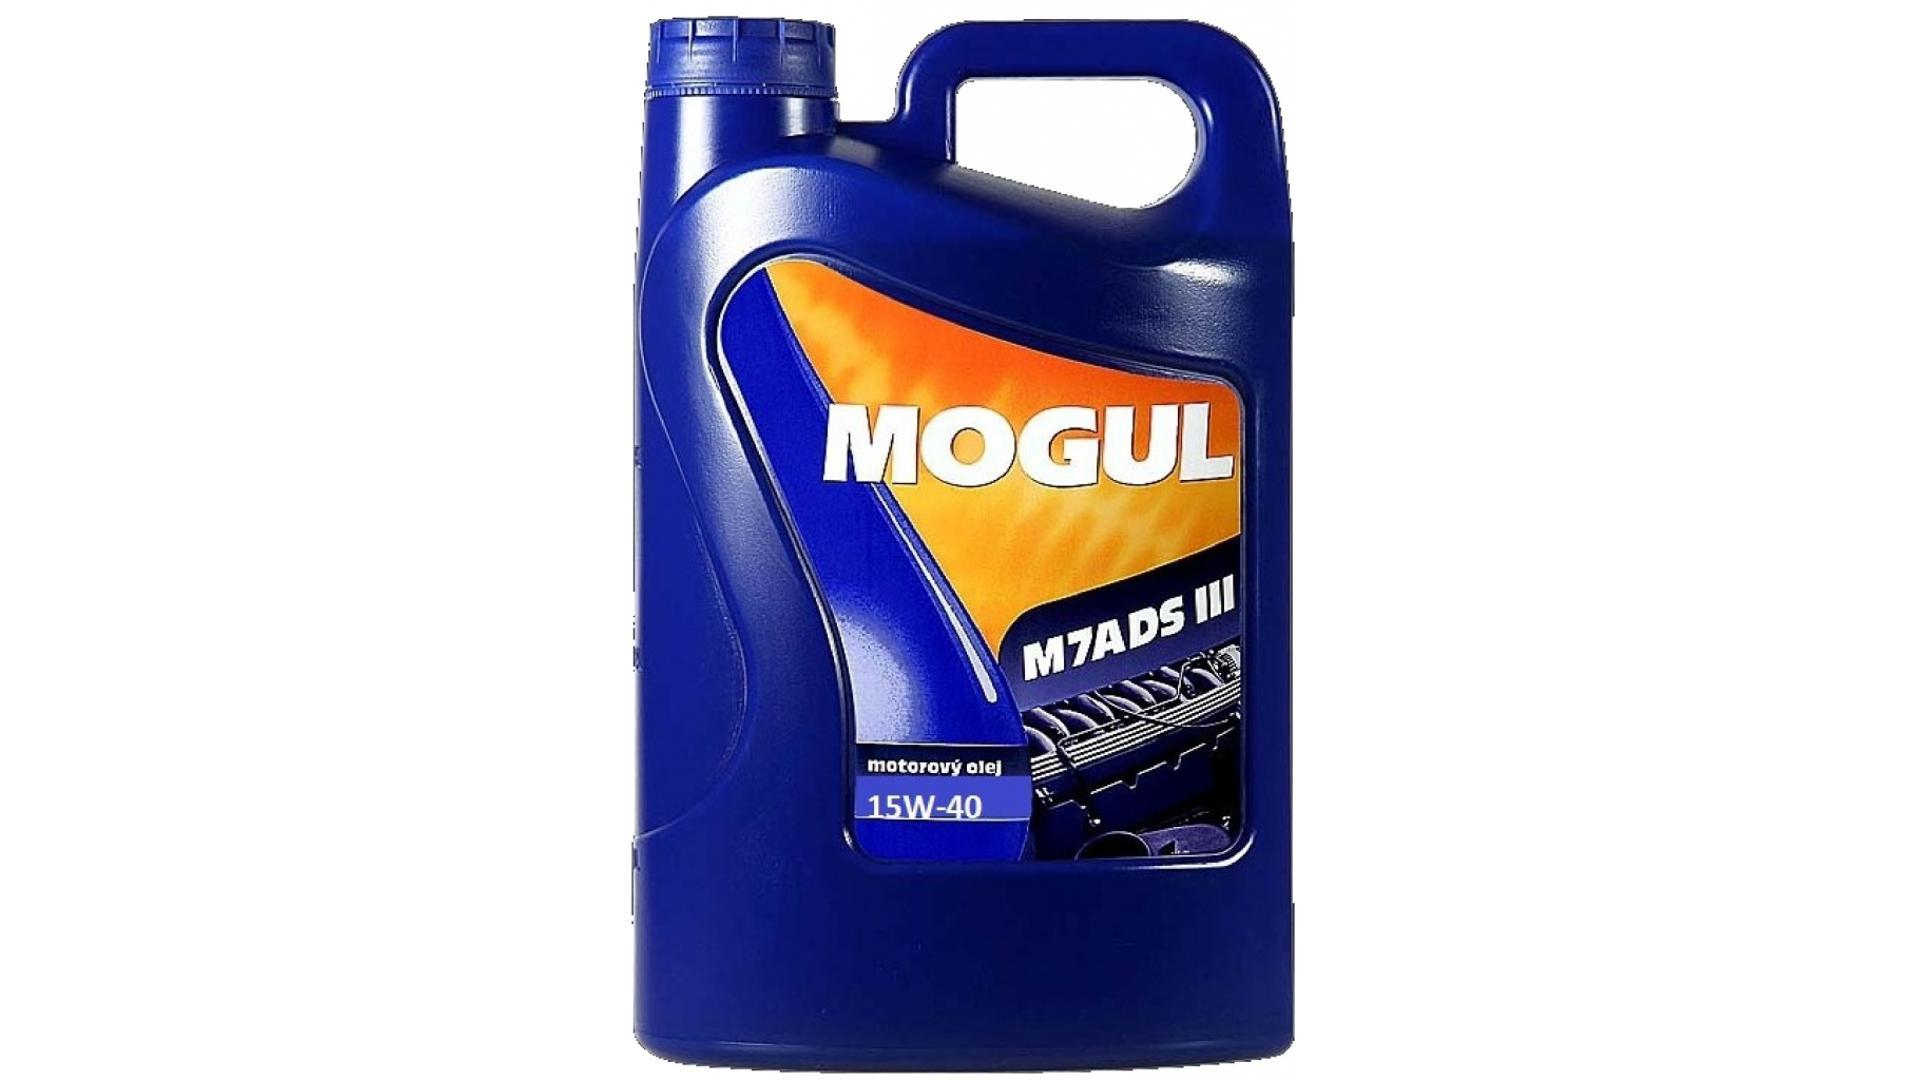 MOGUL M7ADS III 15W-40 /4